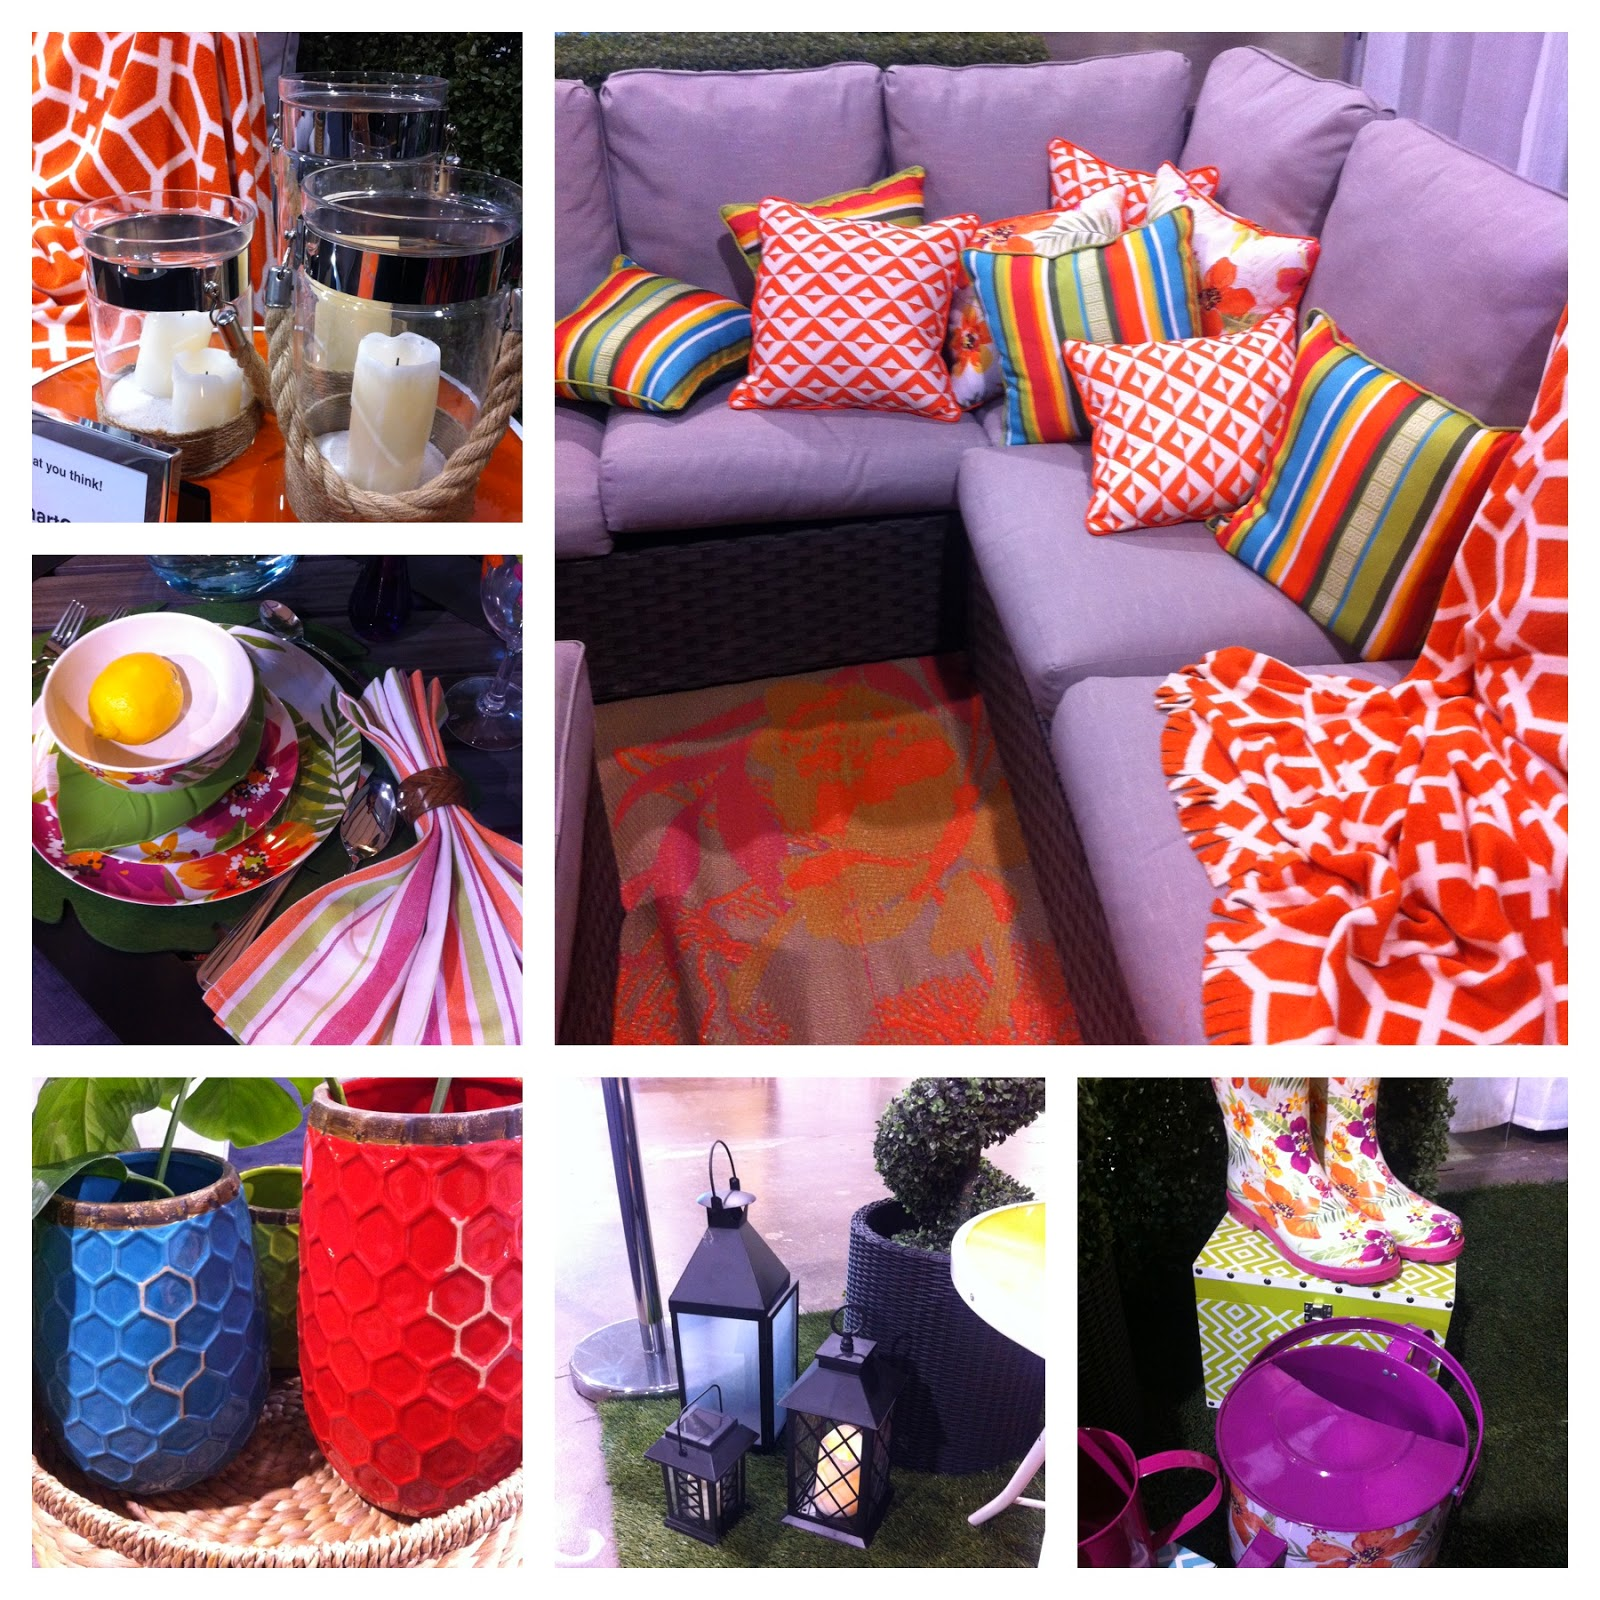 Walmart's Spring/Summer Outdoor Living Collection Shines ... on Walmart Outdoor Living  id=62889